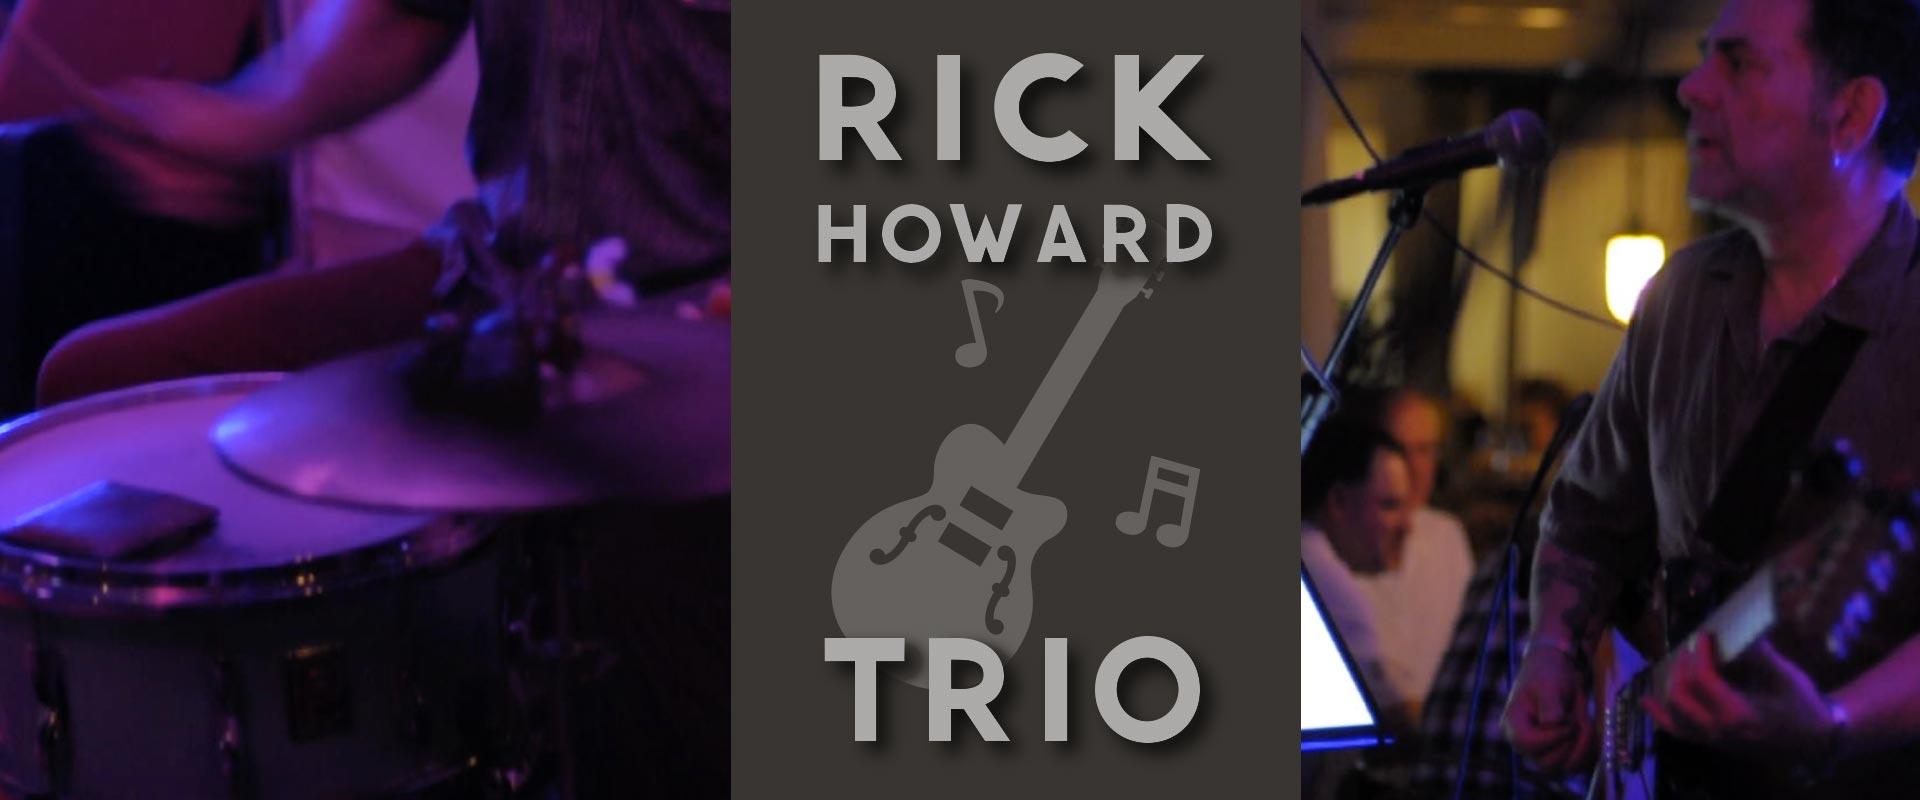 continental music rick howard trio